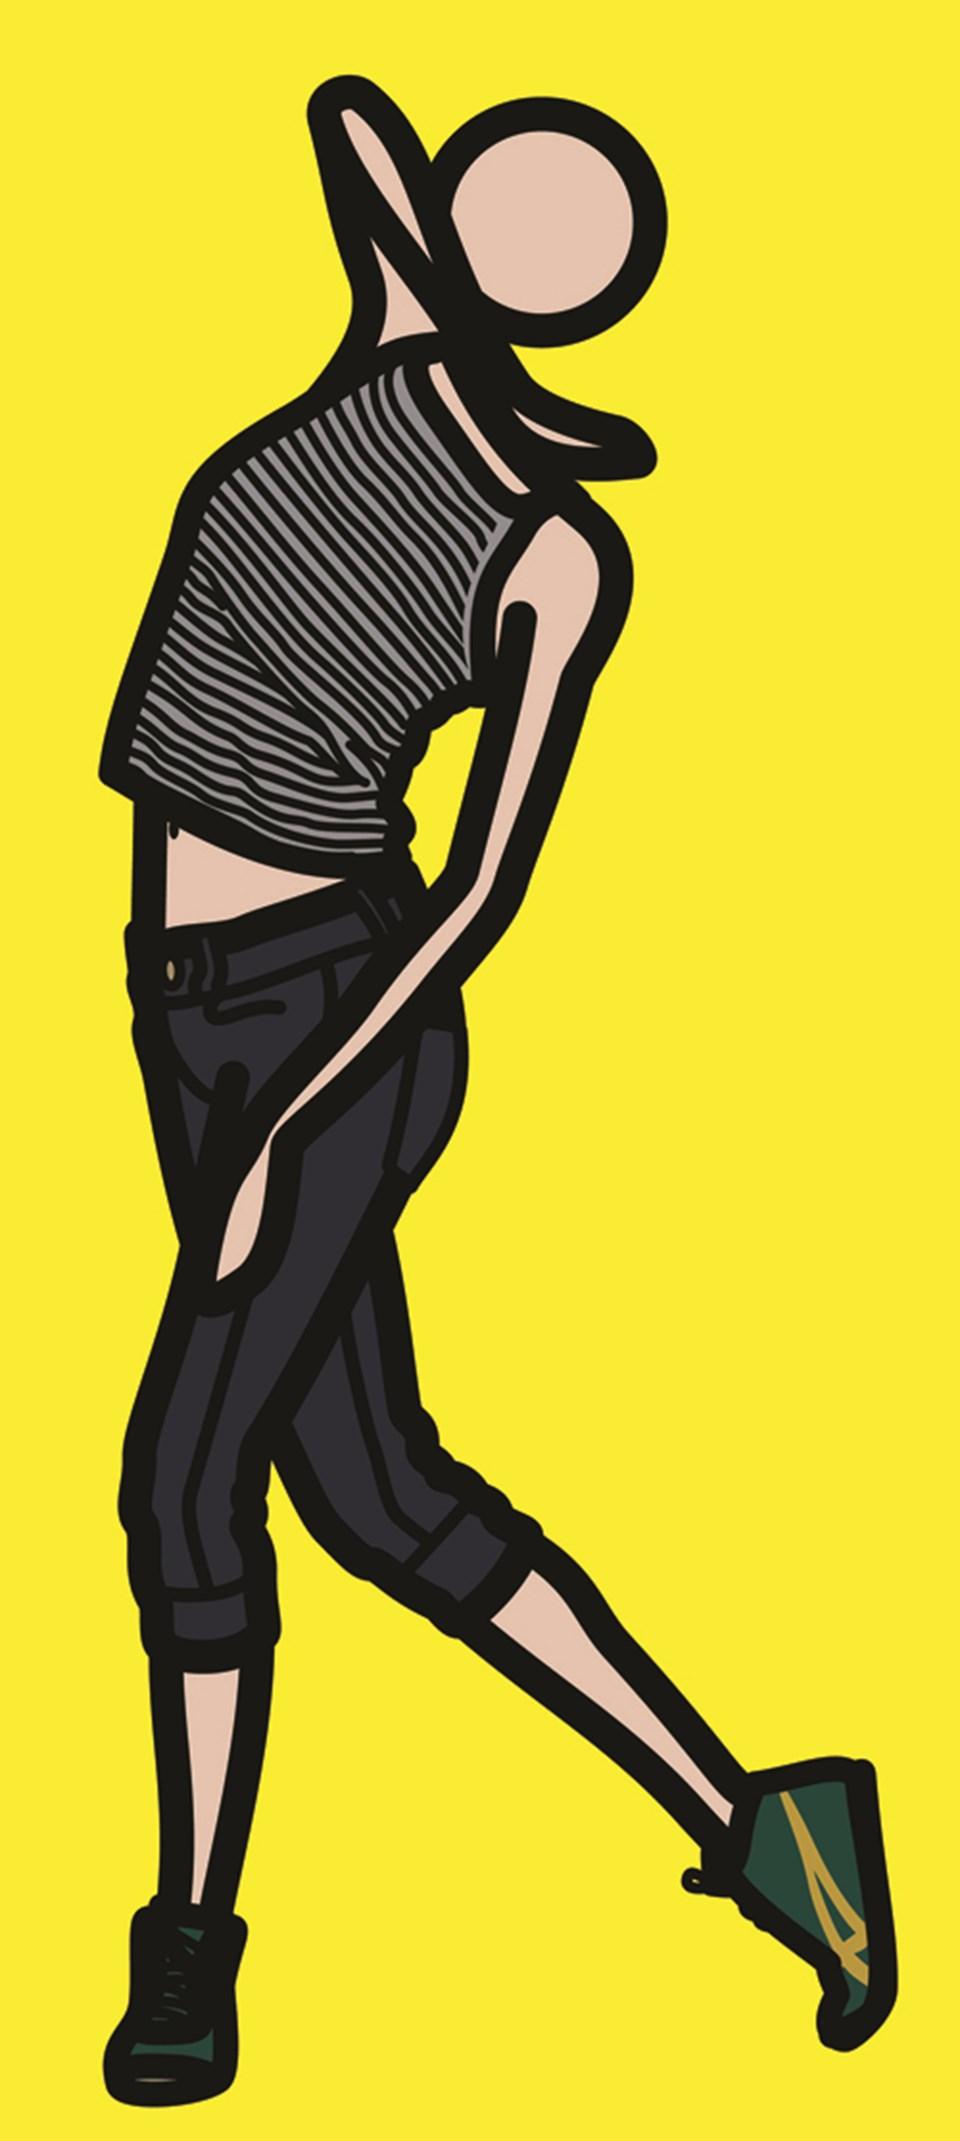 'Caterina Dancing in Stripy Top'